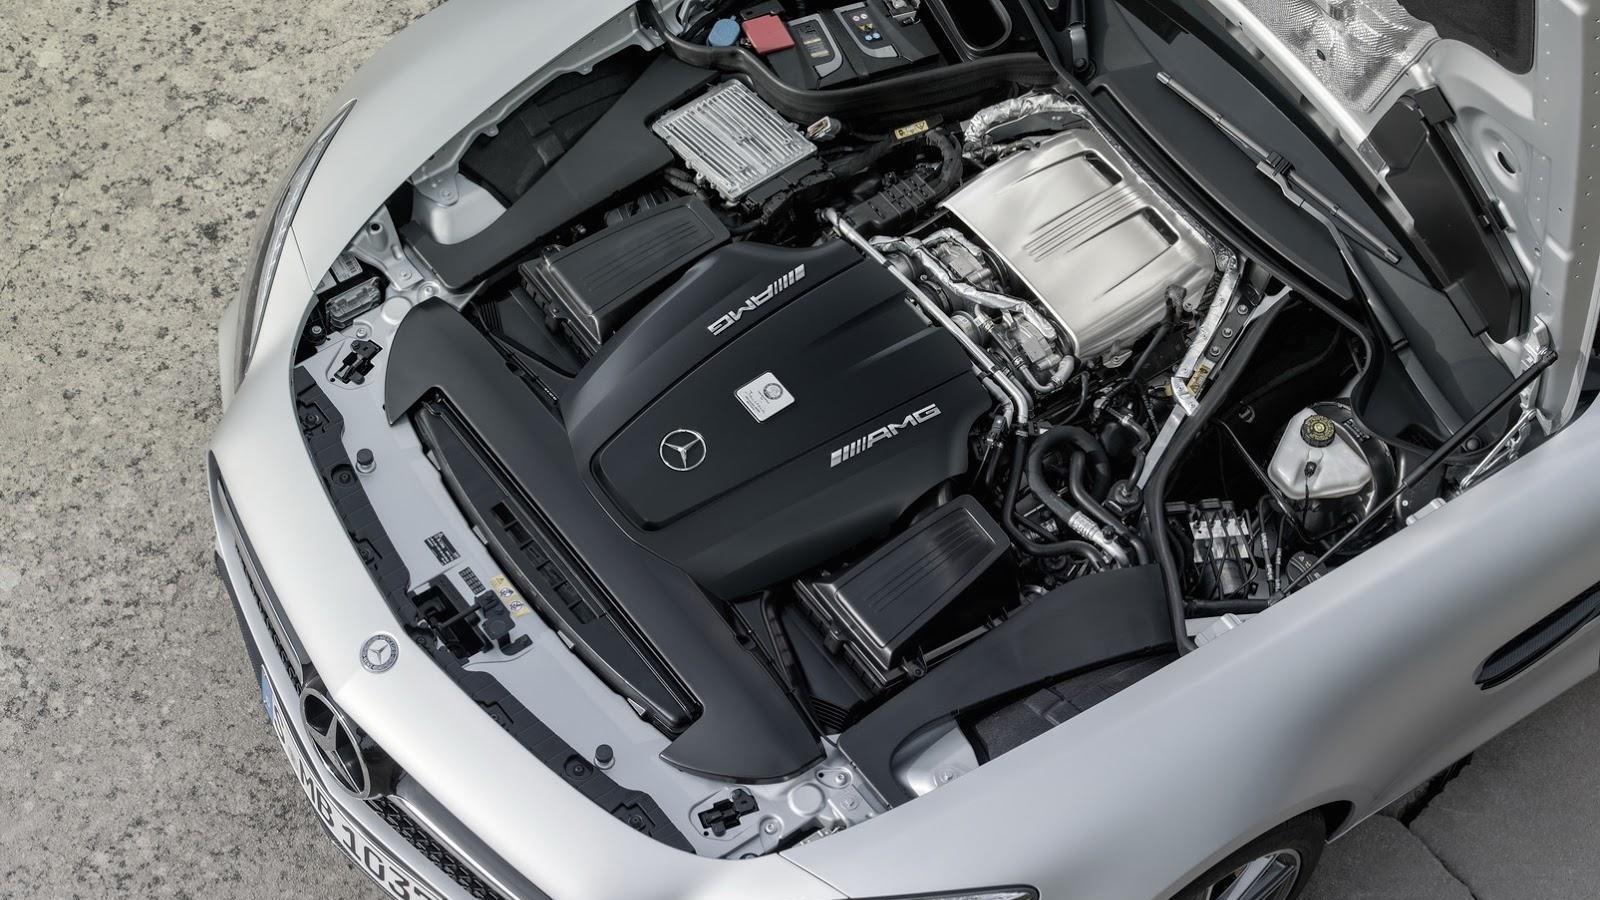 TWIN Turbo V8 Engine